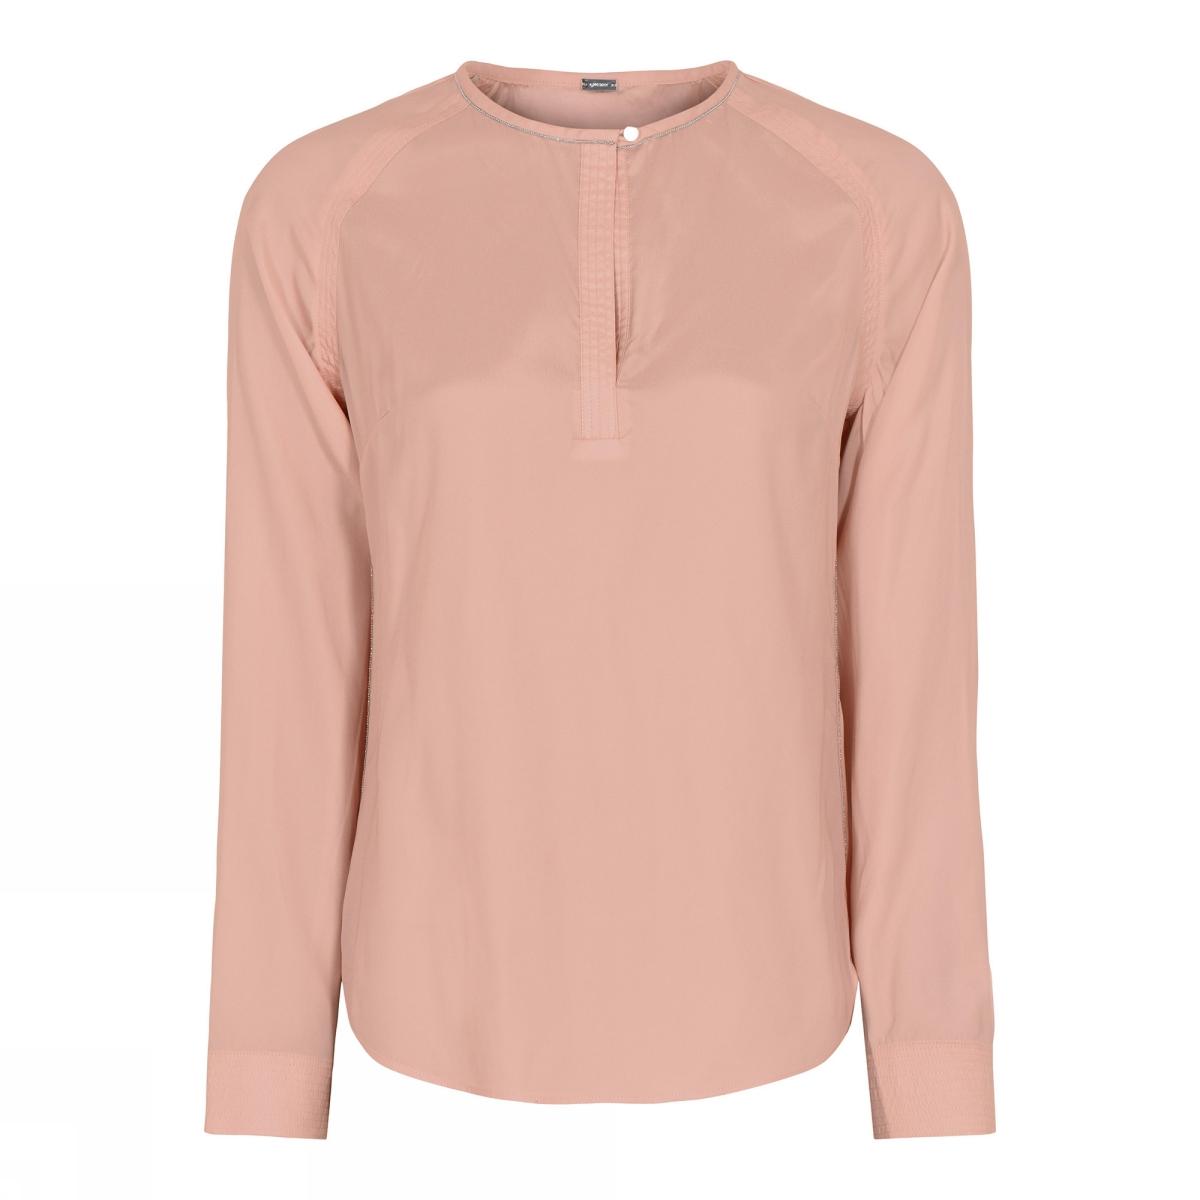 Zacht roze top Gustav 40610-7228-0-362